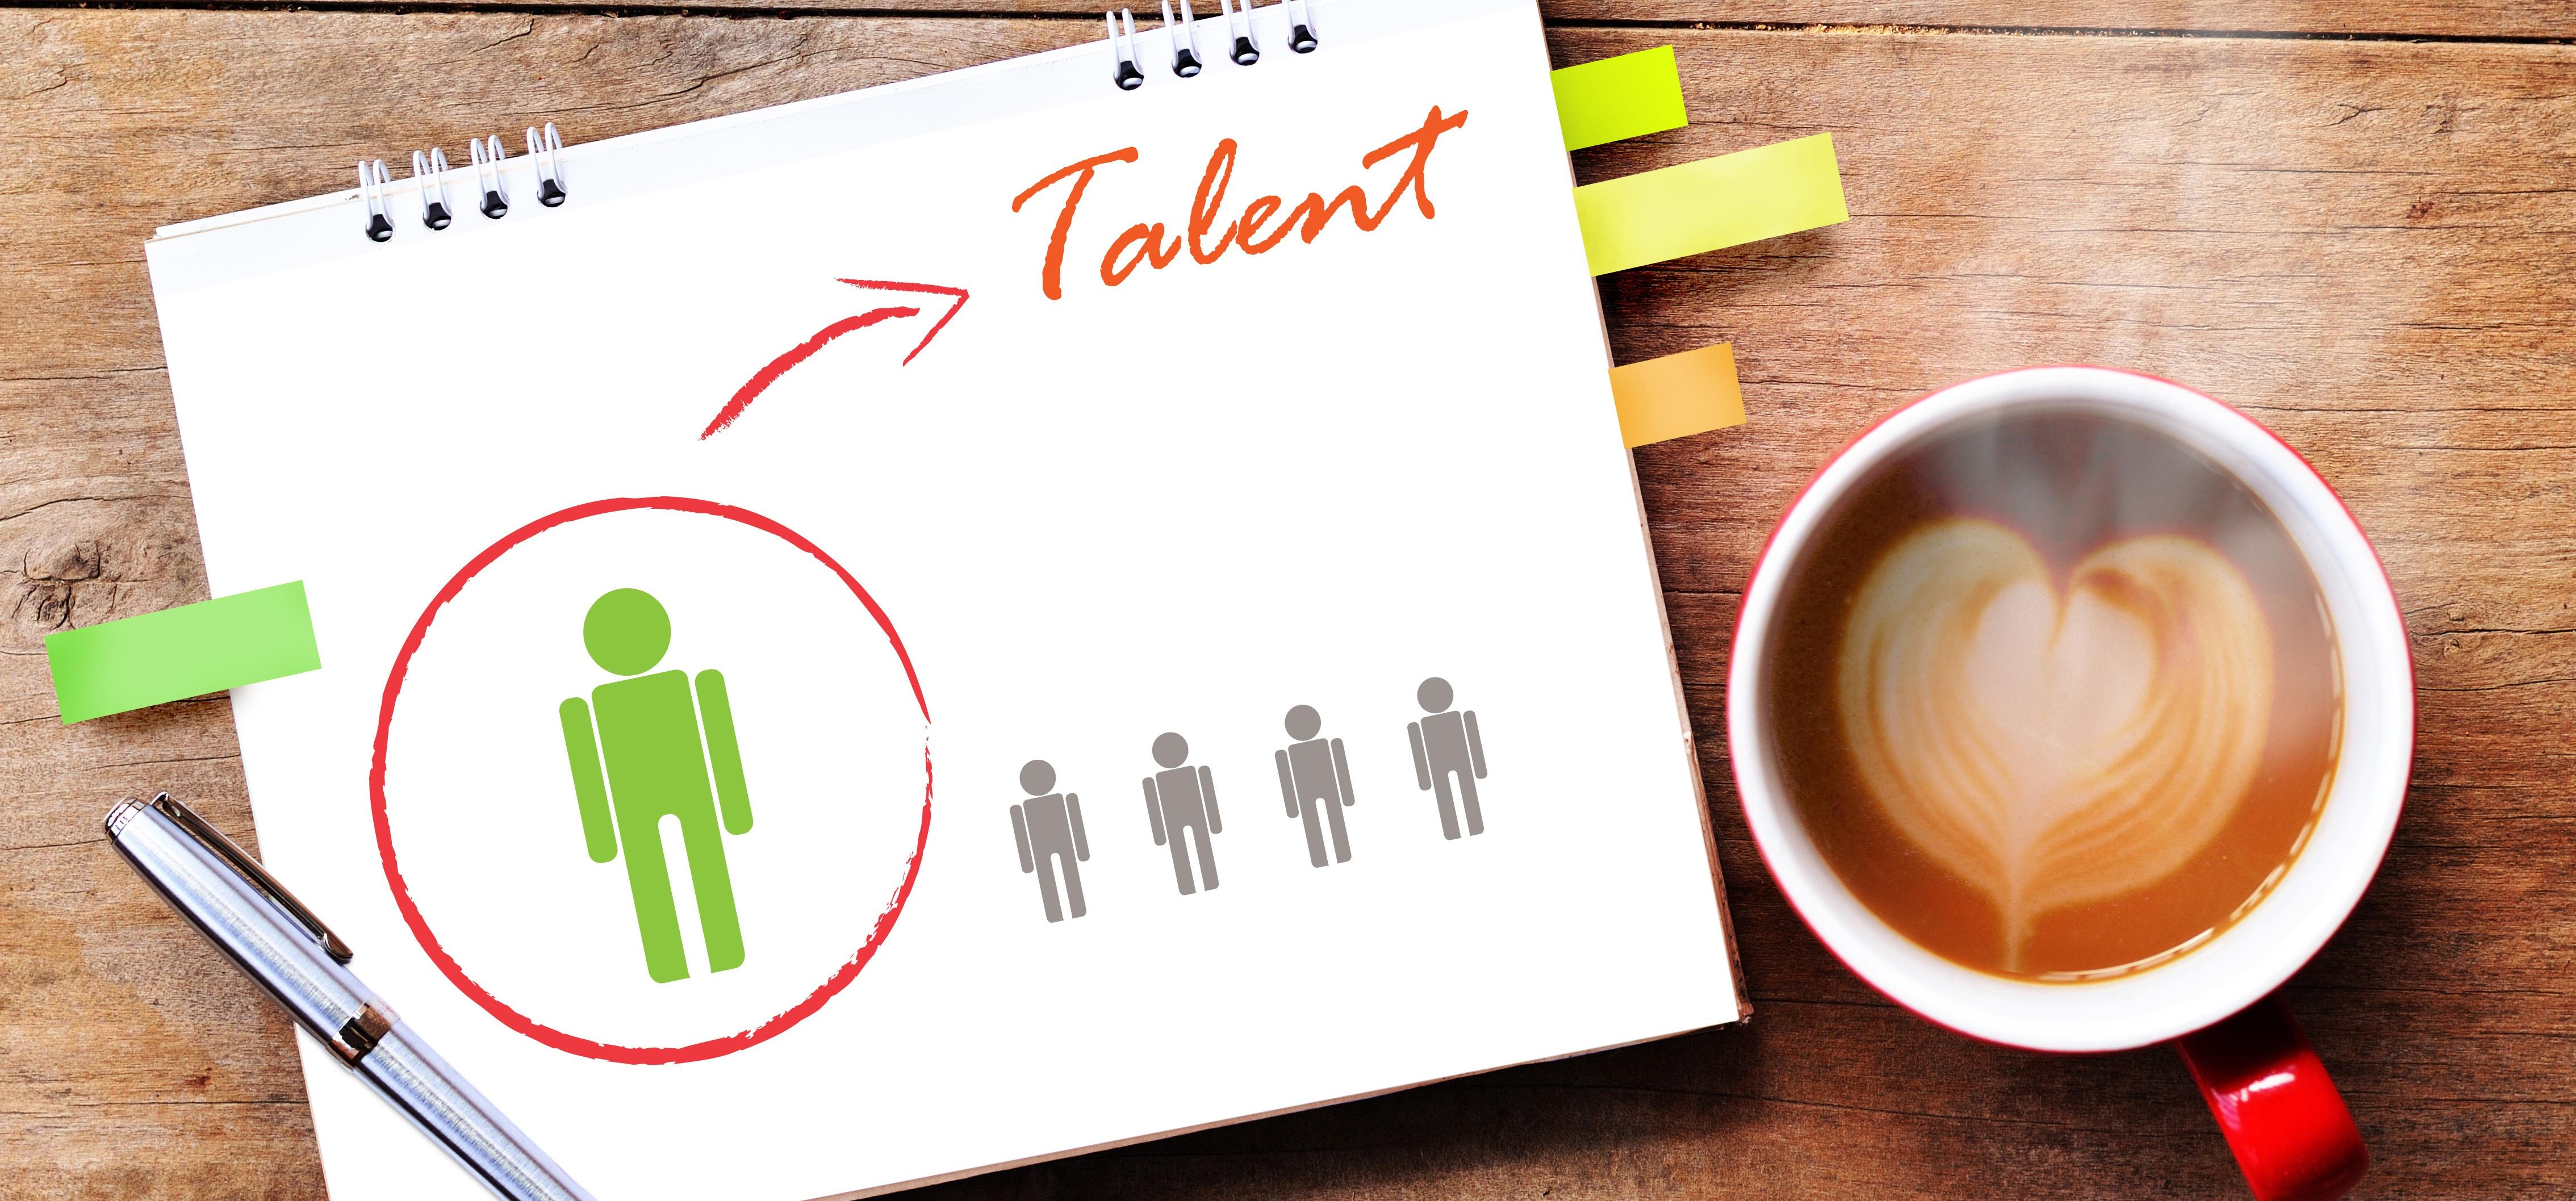 3 Bona Fide Hacks for Hiring the Best Talent